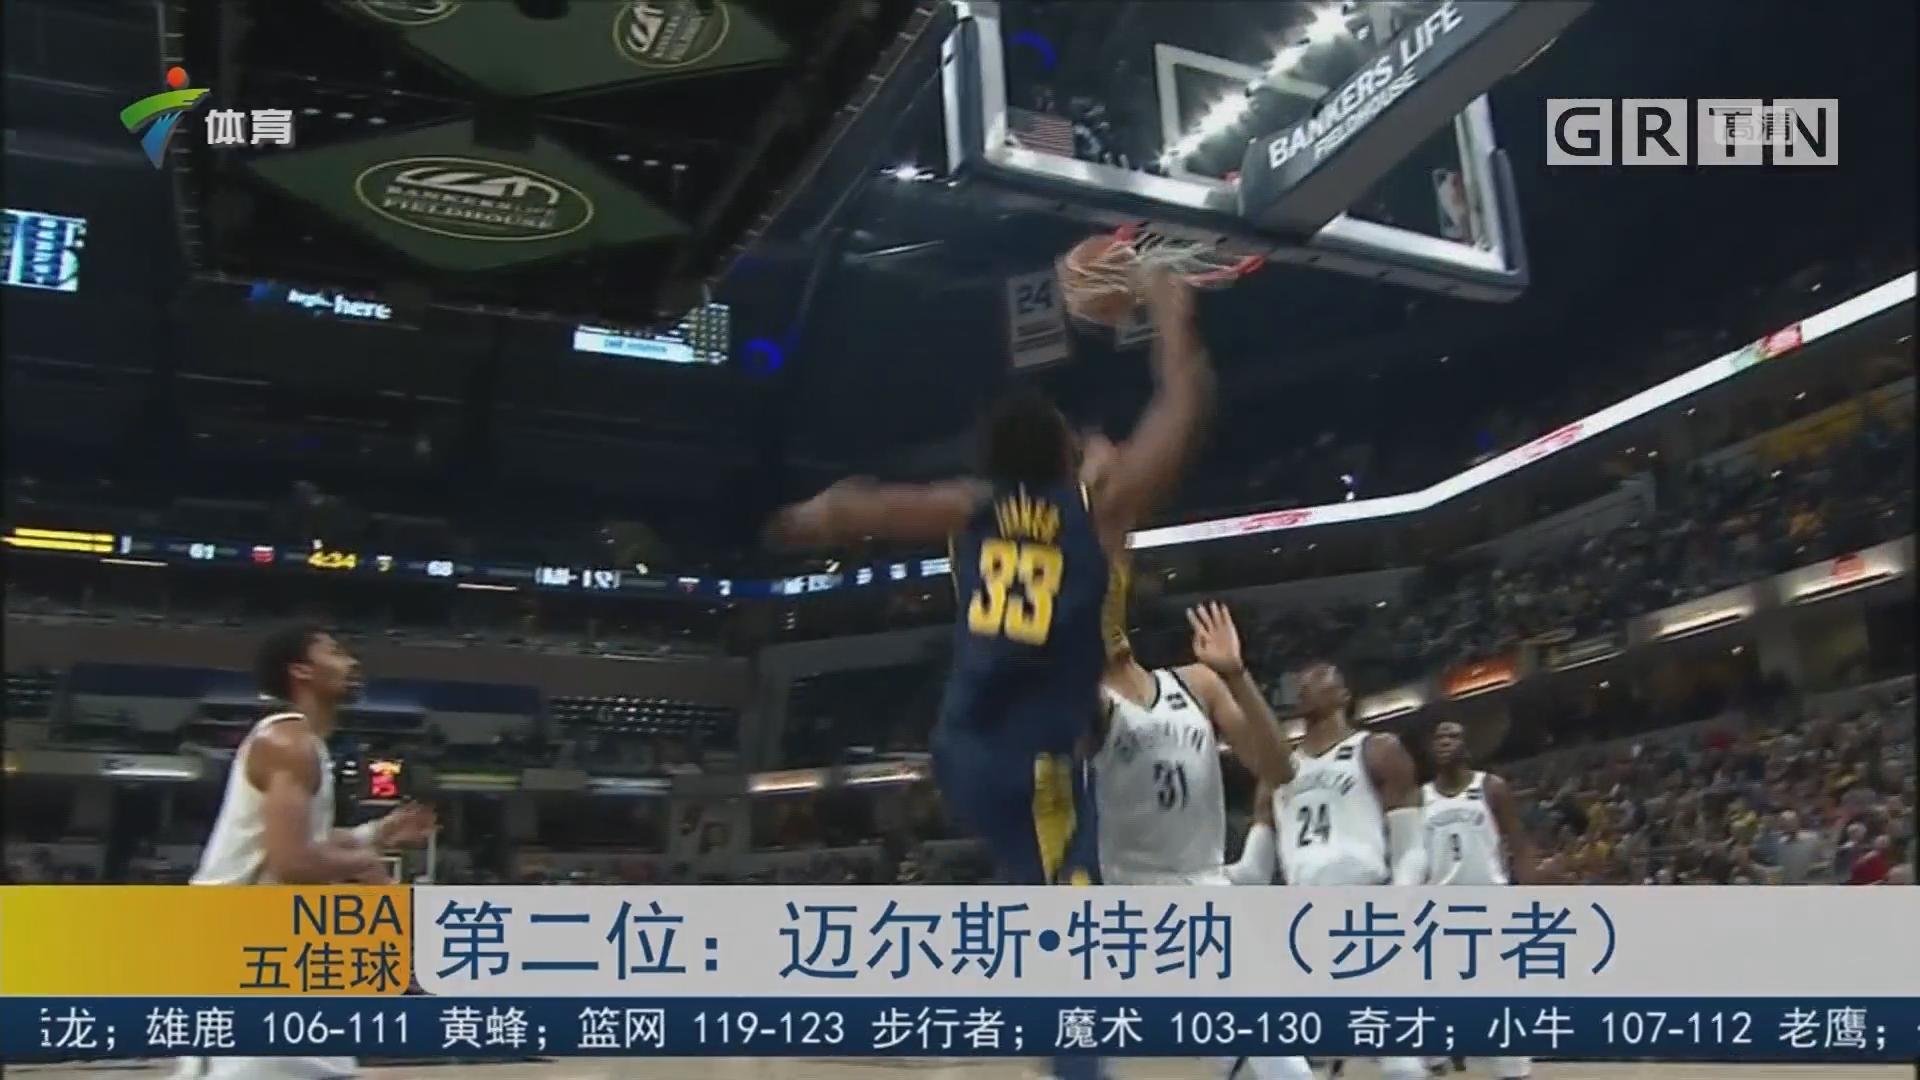 NBA五佳球胜